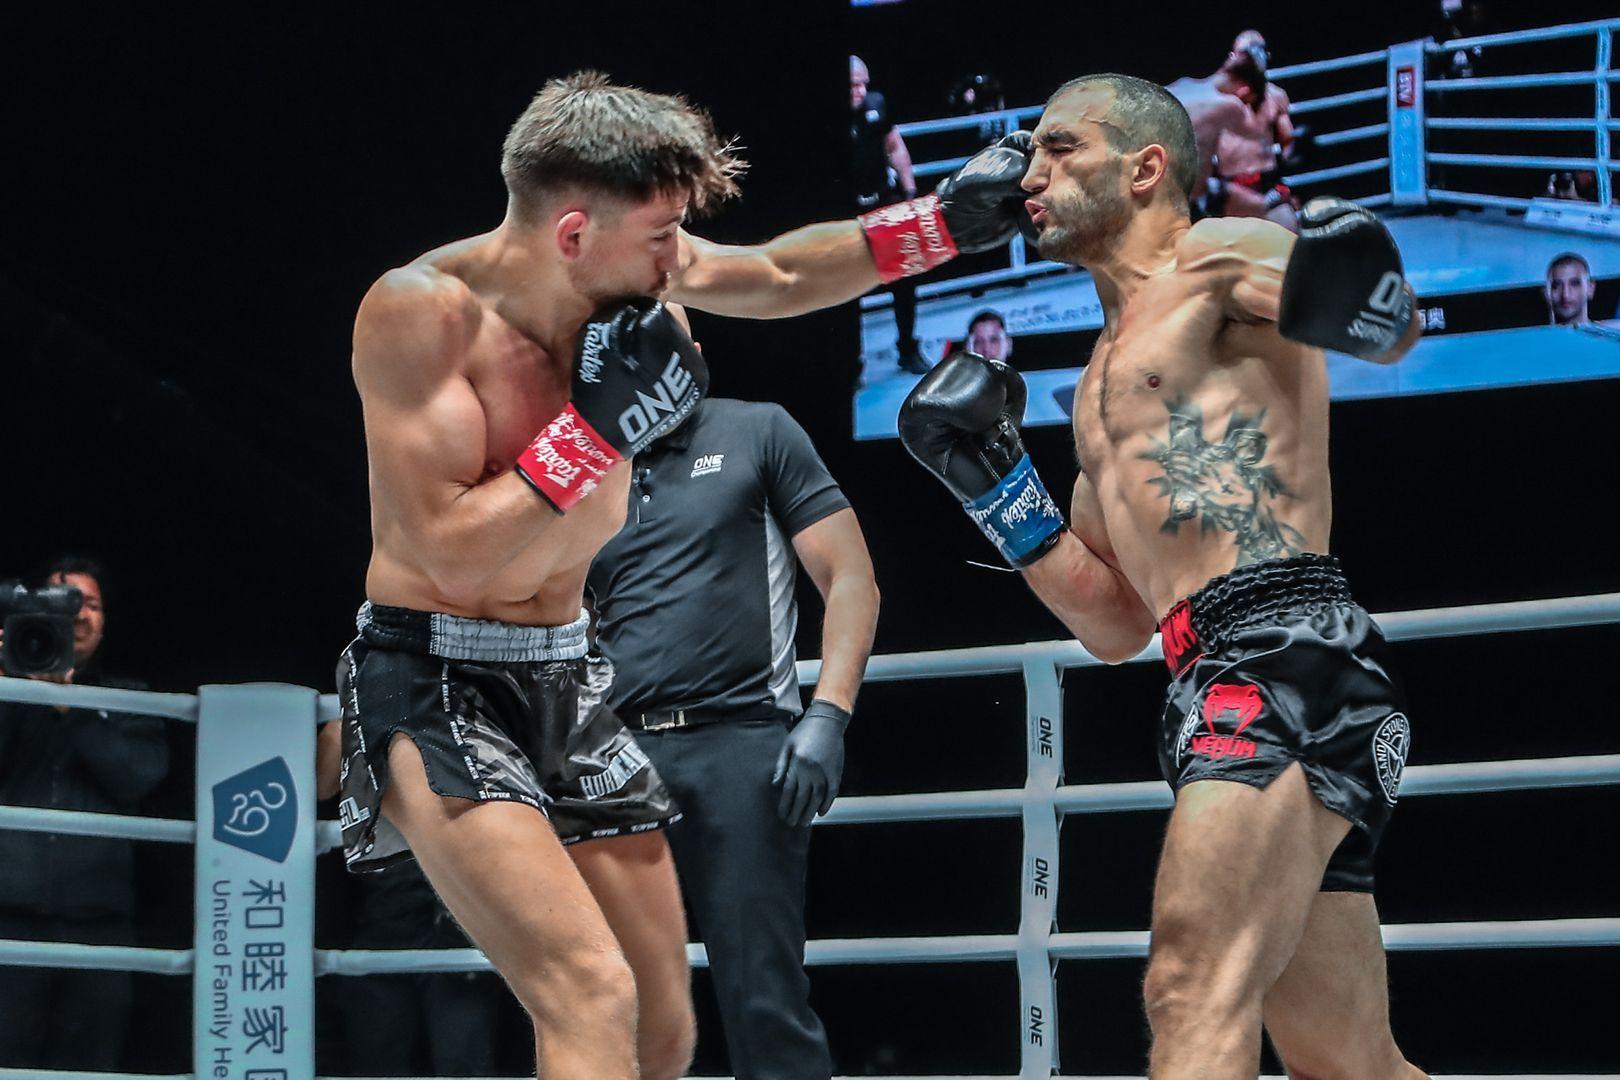 Enriko Kehl defeats Armen Petrosyan at ONE AGE OF DRAGONS in Beijing